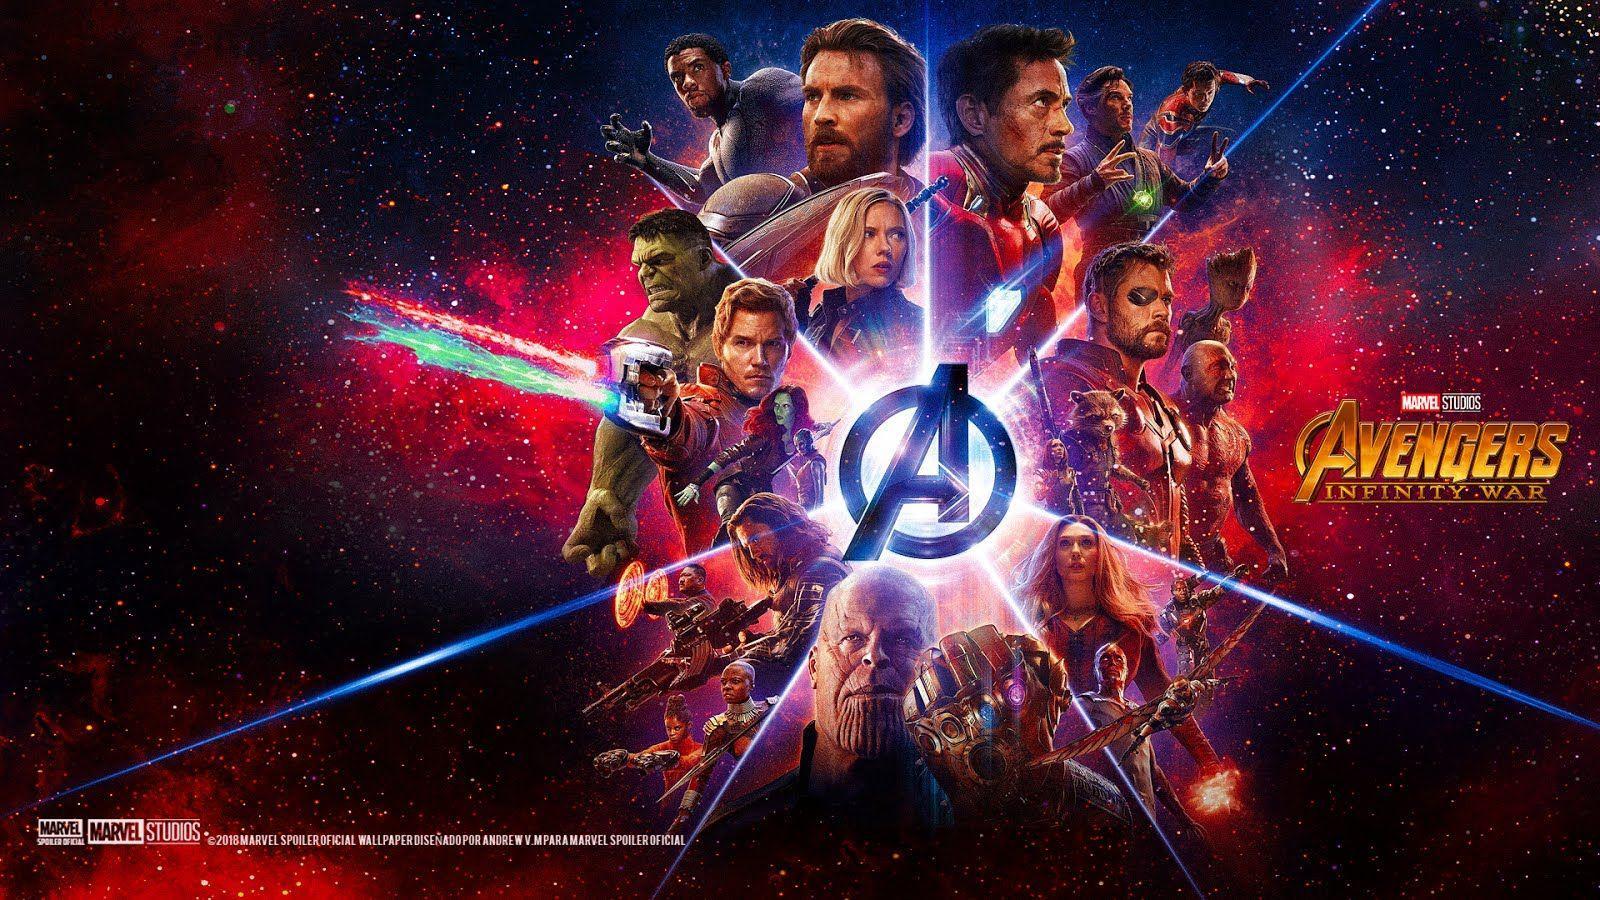 Avengers Infinity War Hd Wallpapers Wallpaper Cave